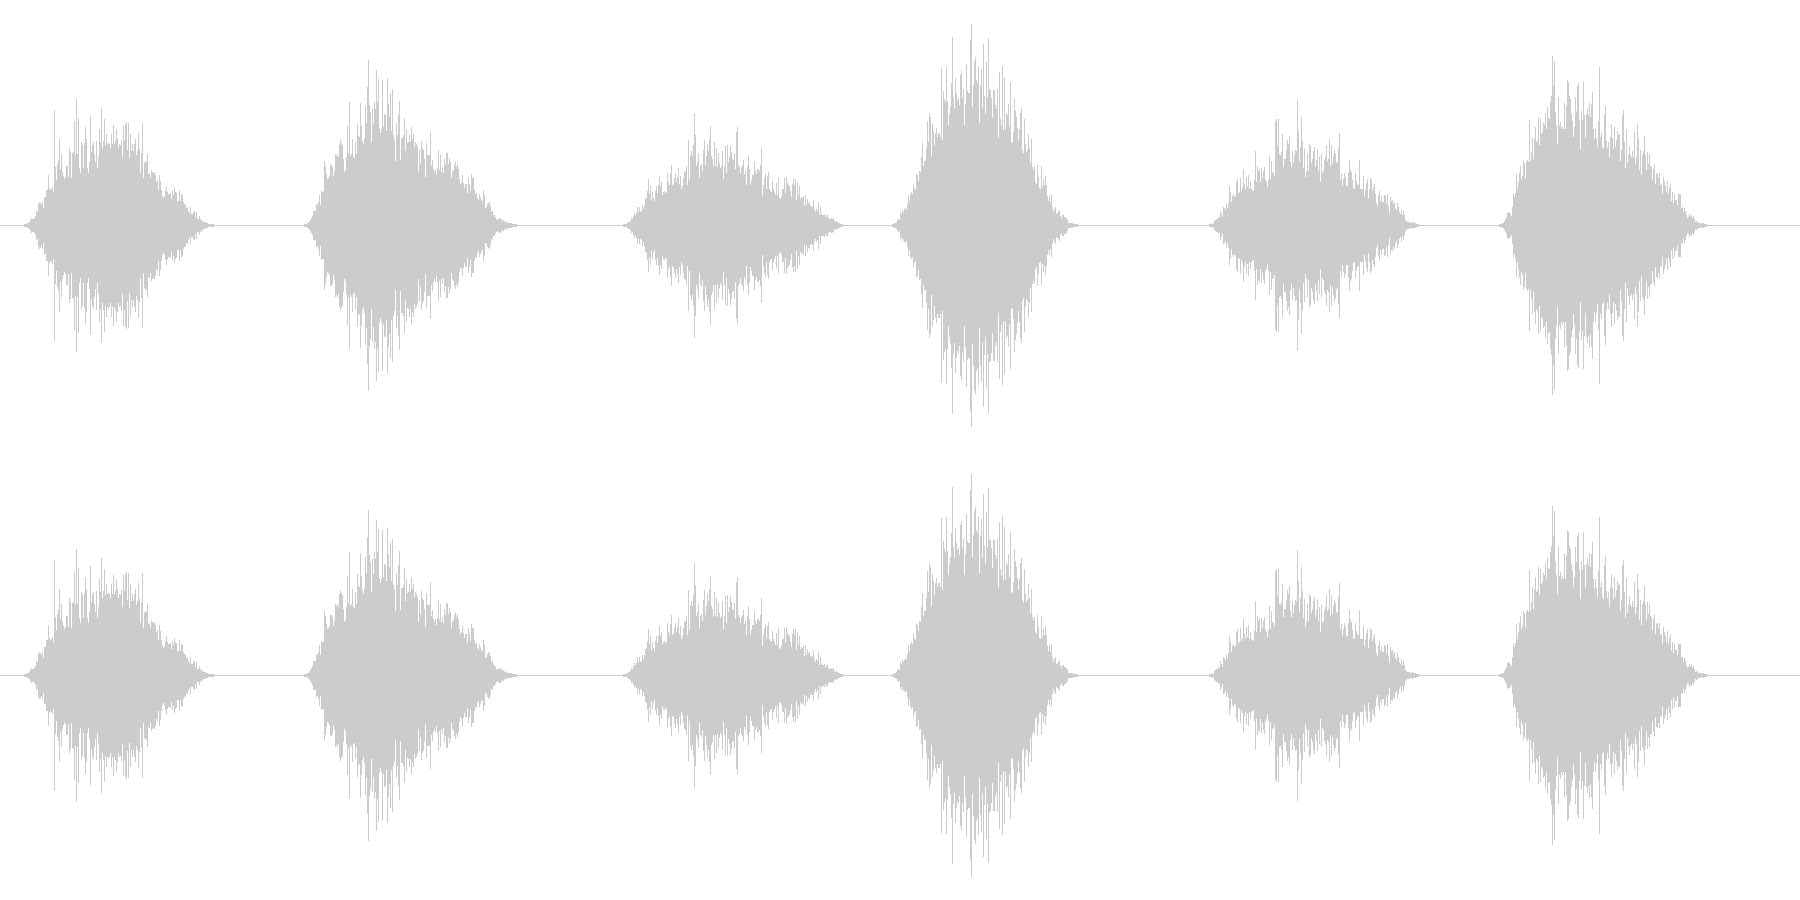 PC マウス ムーブ03-16(ハード)の未再生の波形